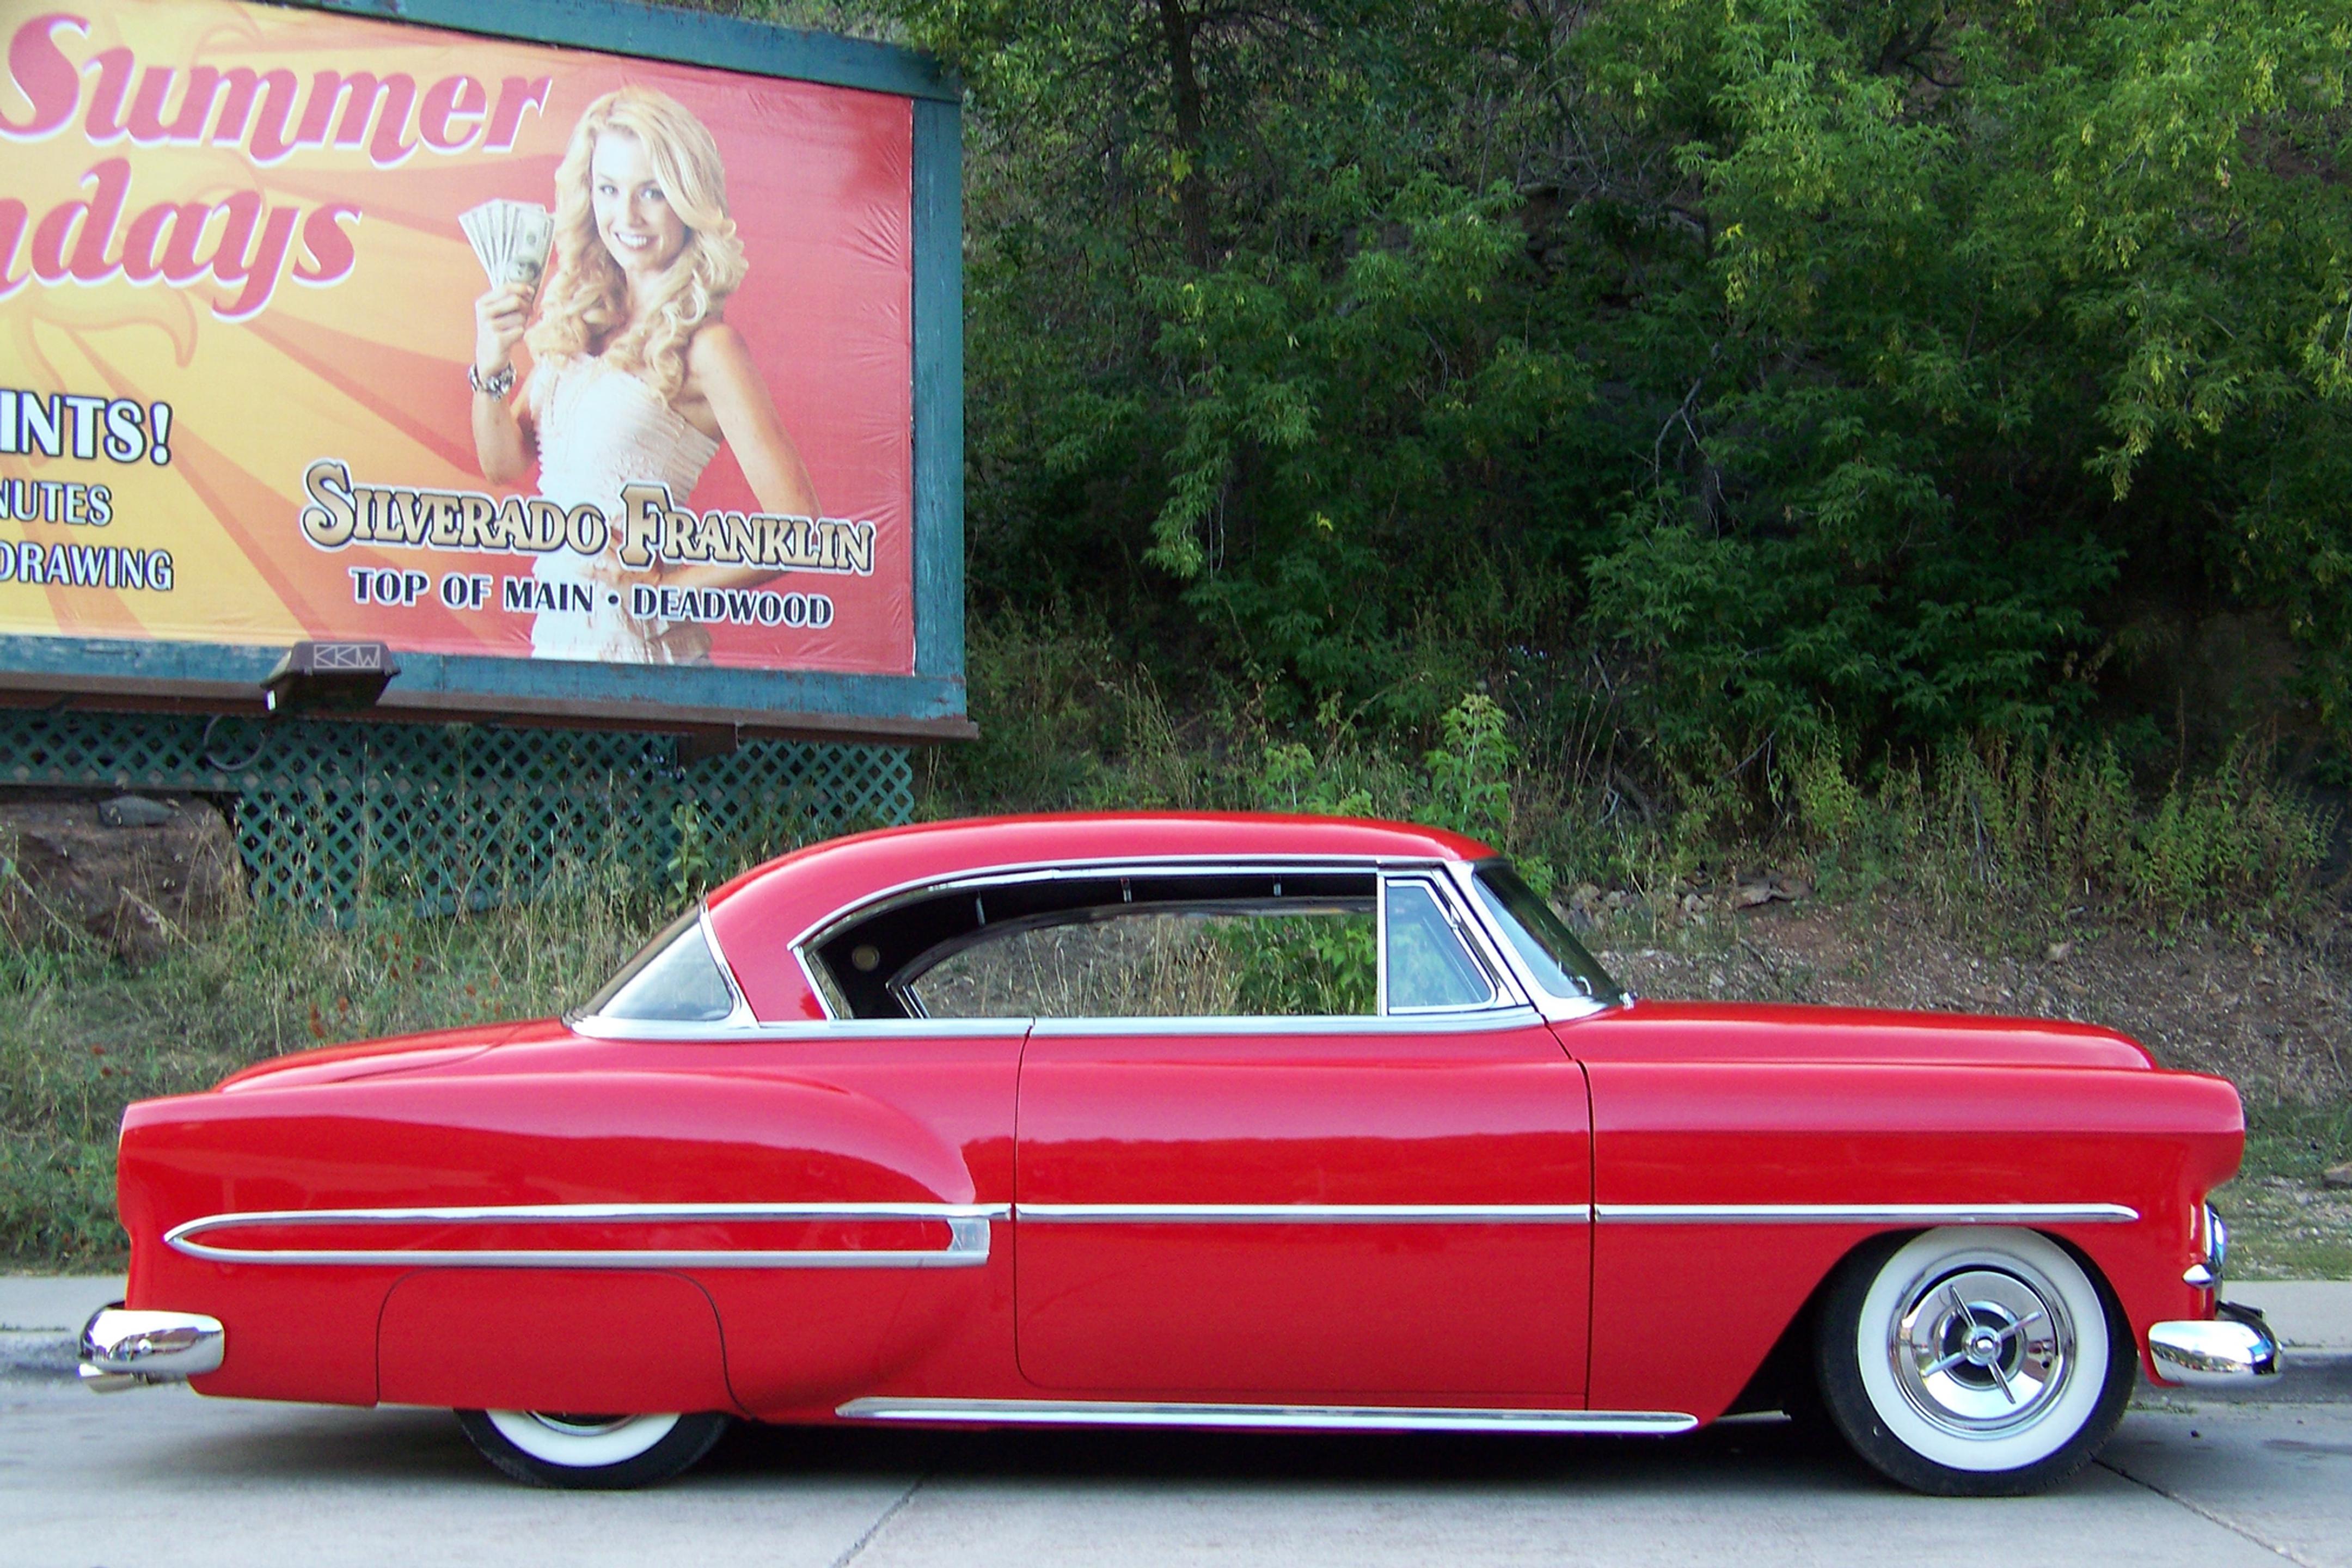 Car at Kool Deadwood Nites, SD 8/23/2013 7:09PM by Crigger